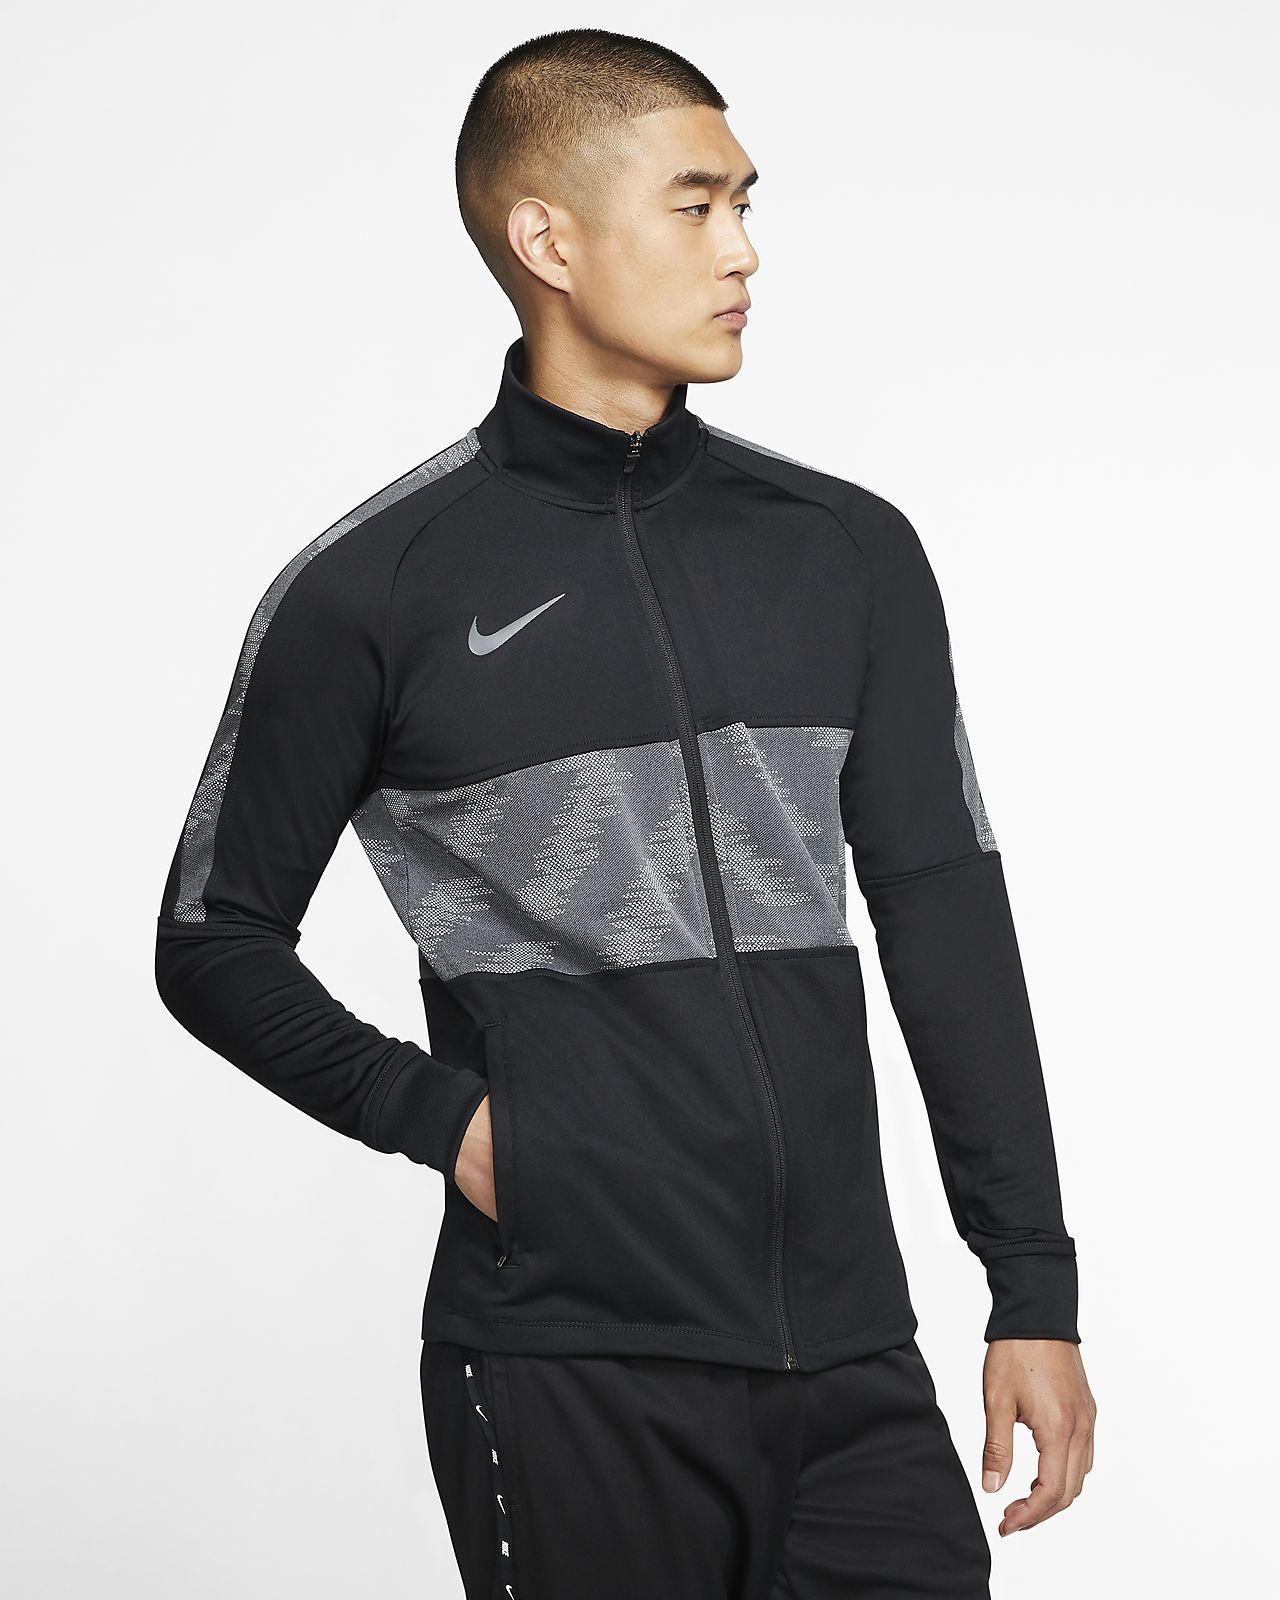 giacche da calcio nike